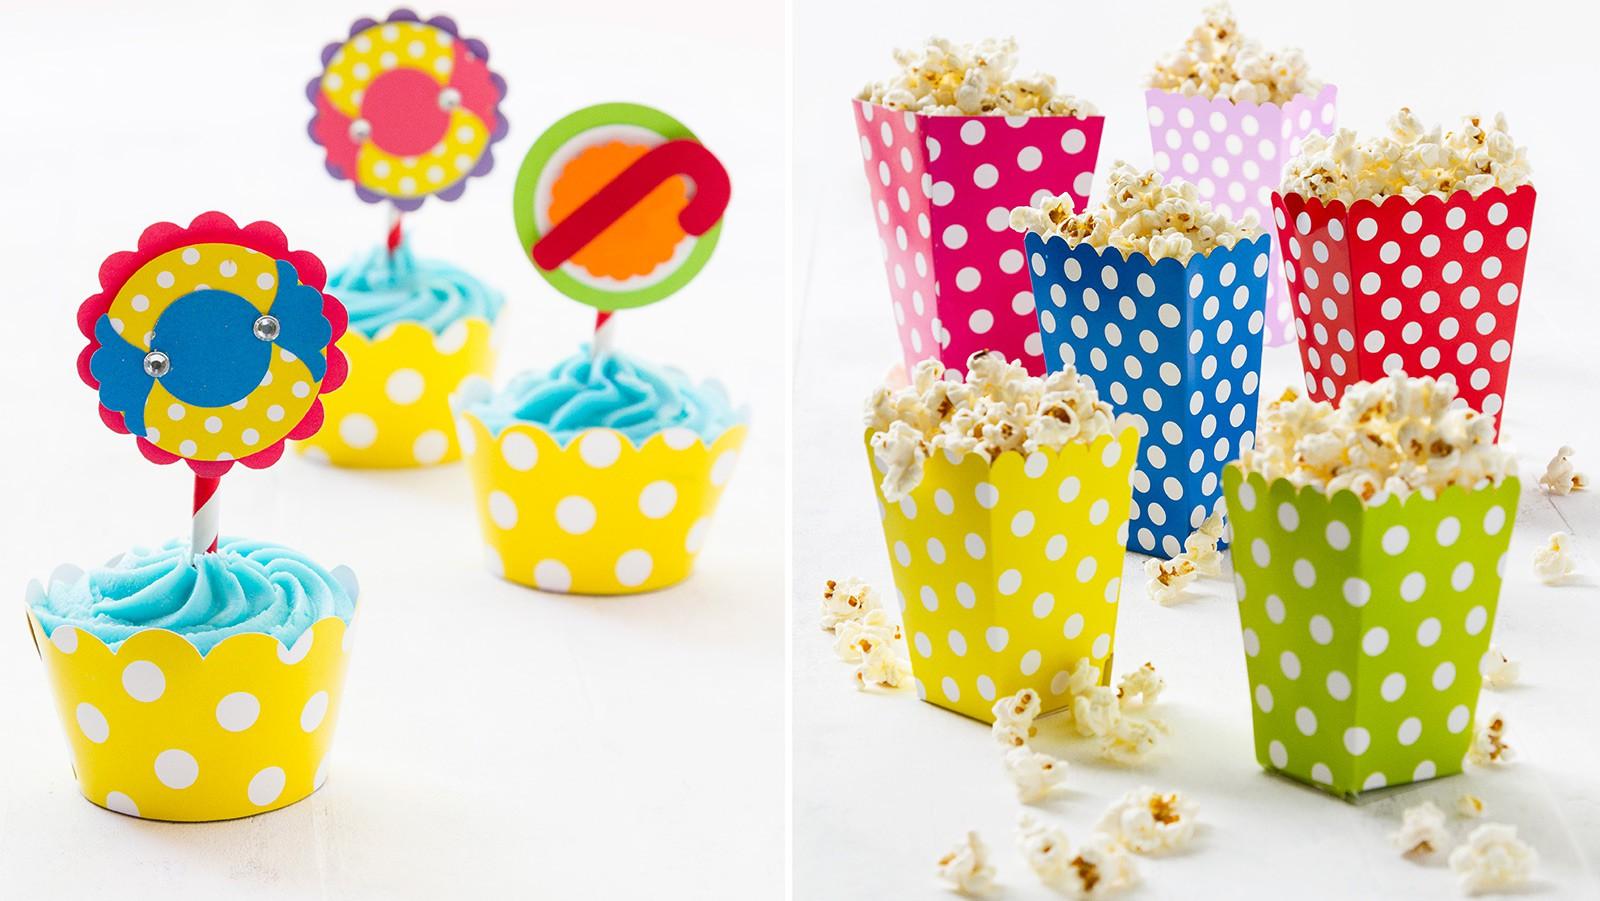 Candyland Cupcakes & Polka Dot Popcorn Boxes